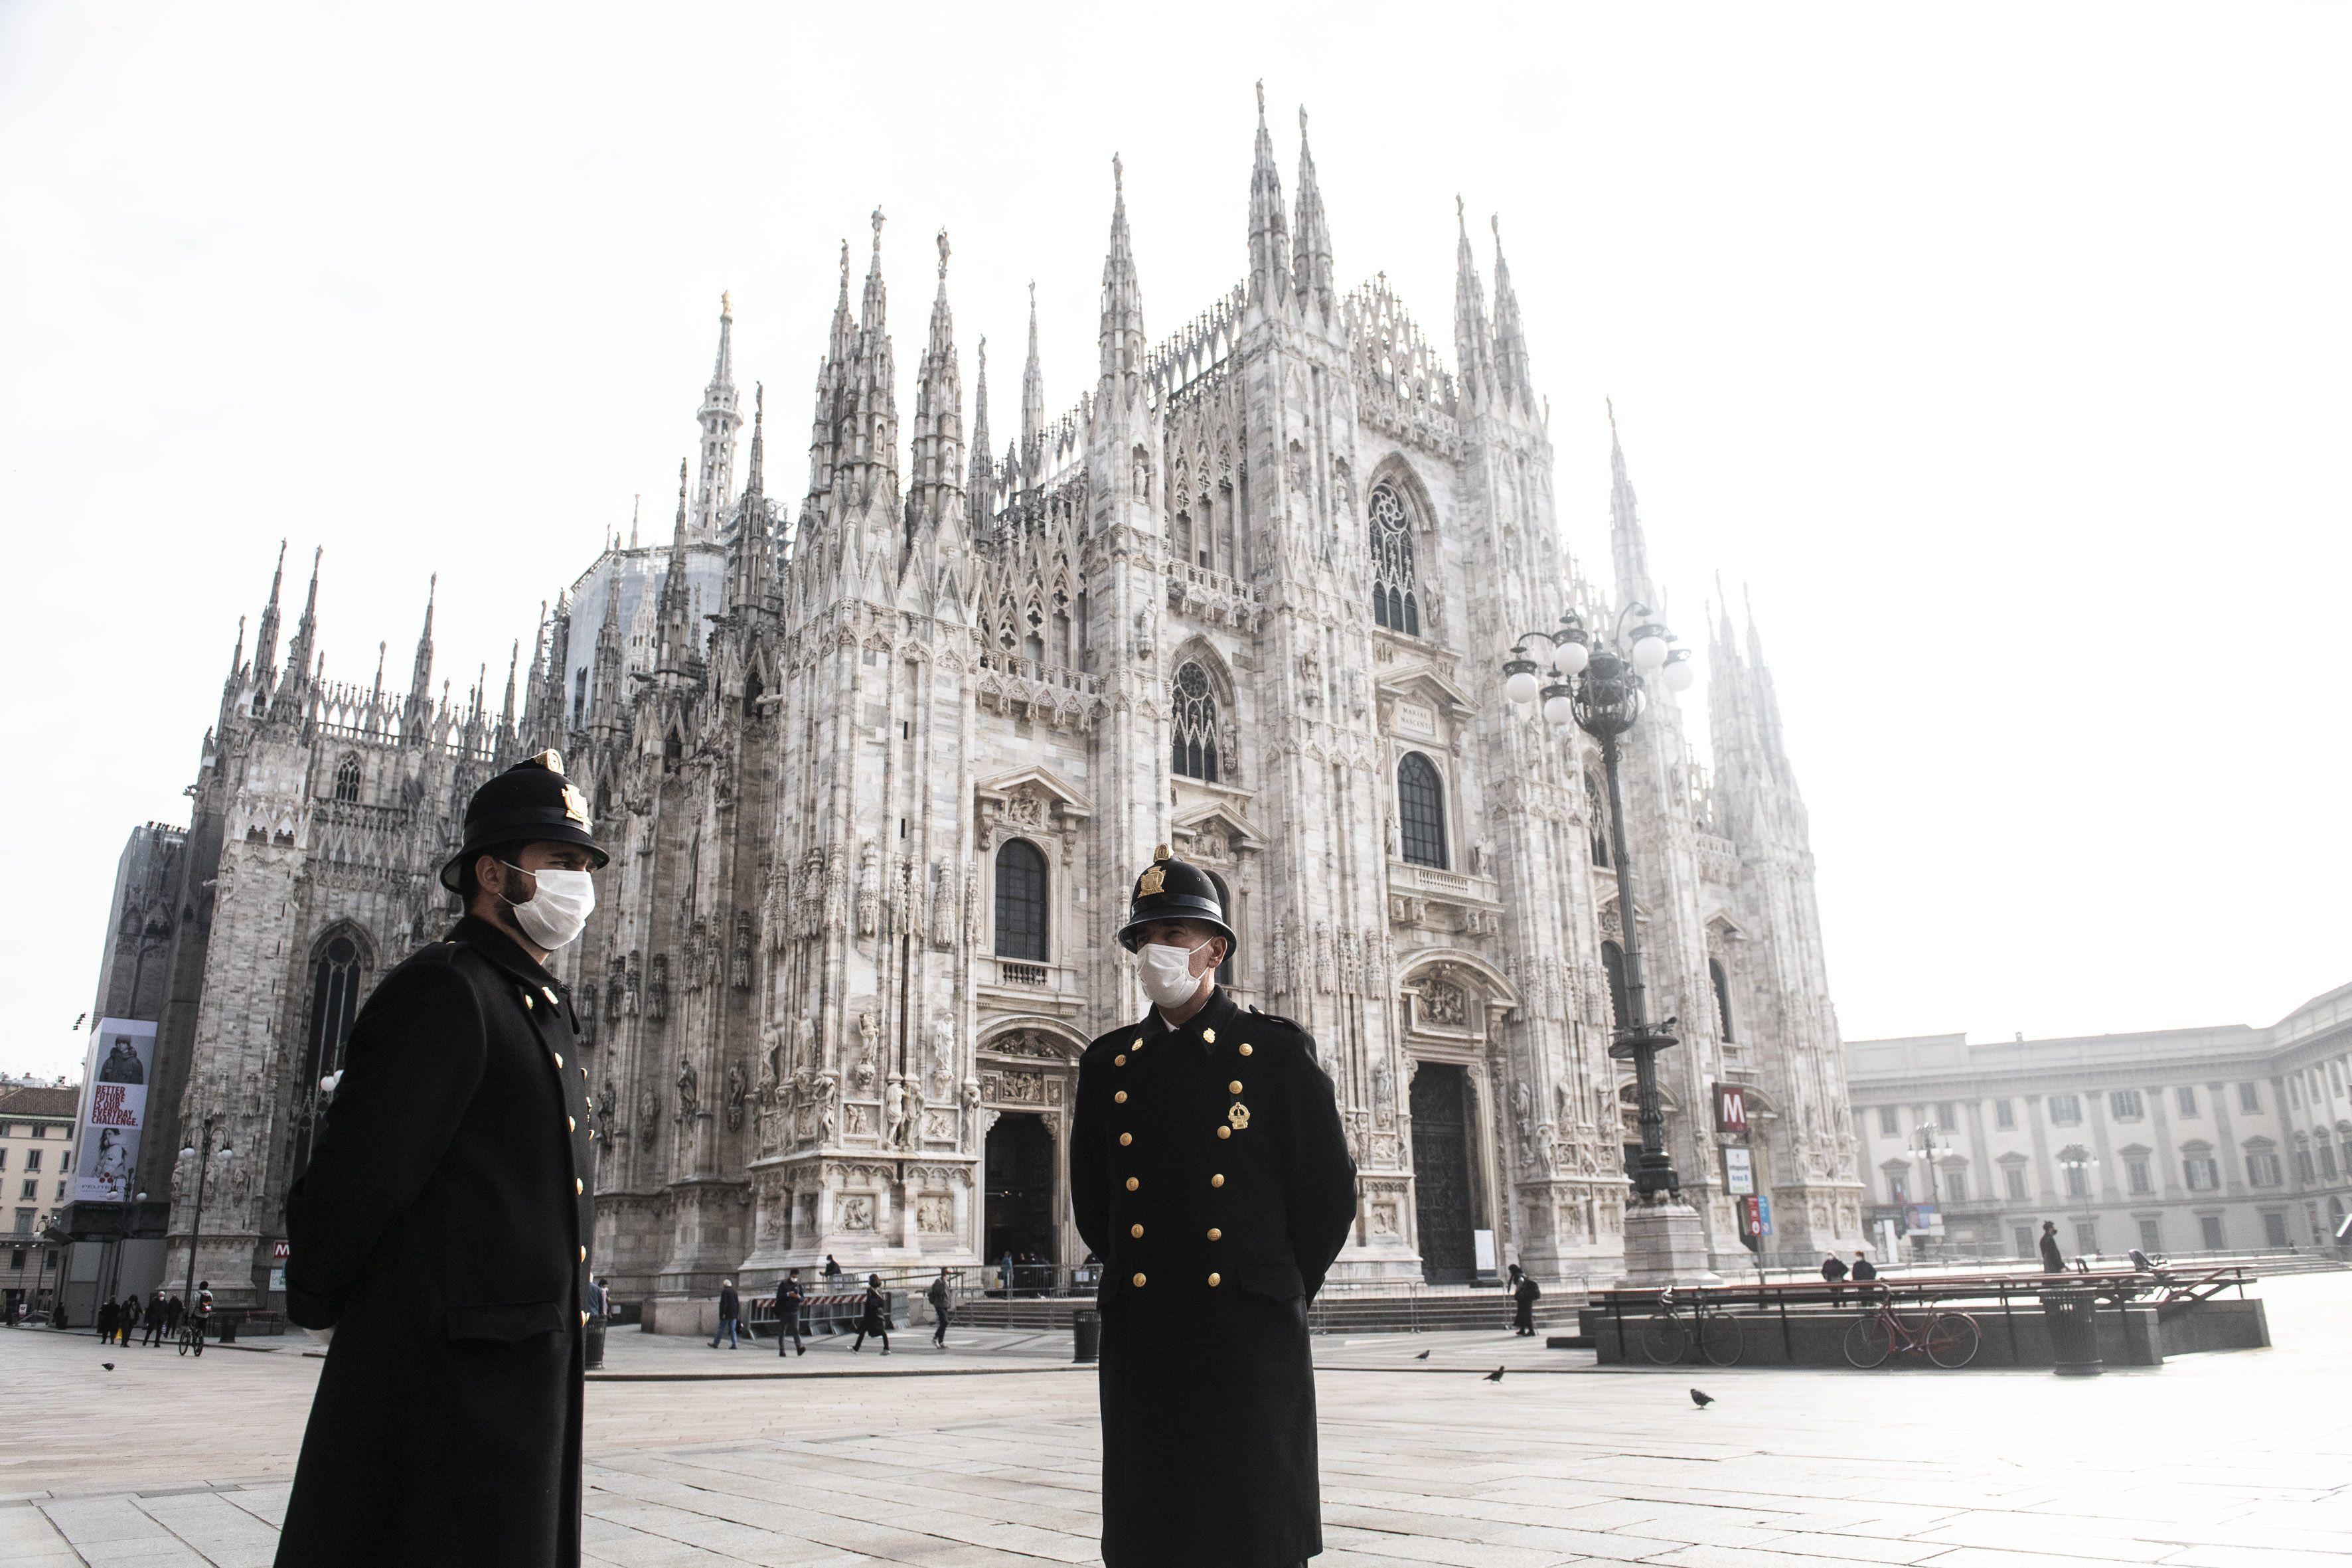 06/11/2020 Personas con mascarilla en Milán POLITICA EUROPA ITALIA MATTEO BIATTA / ZUMA PRESS / CONTACTOPHOTO